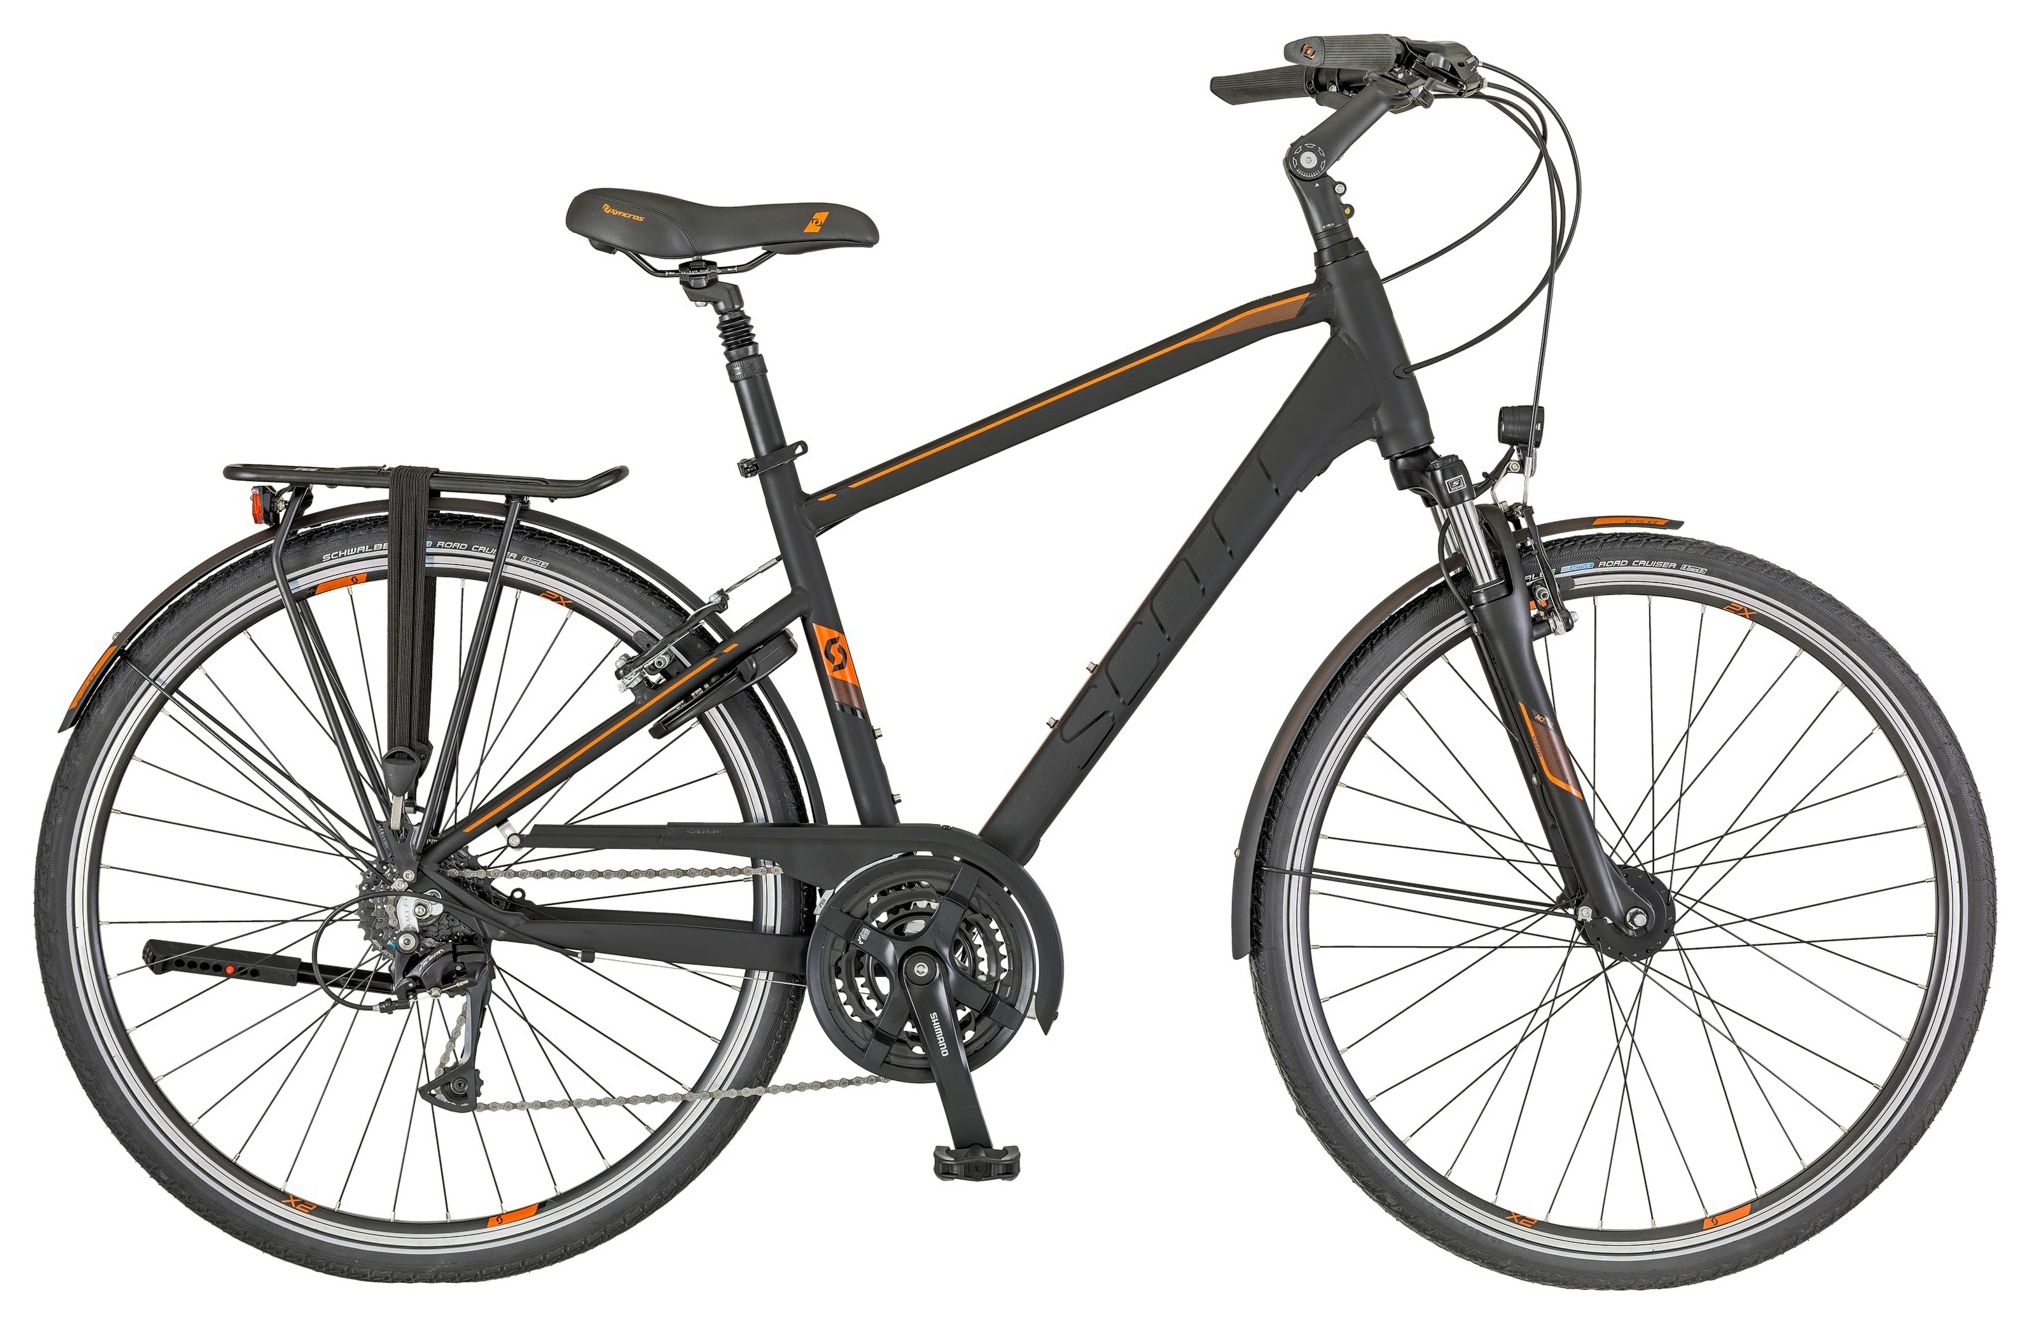 Велосипед Scott Sub Comfort 10 Men 2018 велосипед scott contessa solace 25 compact 2016